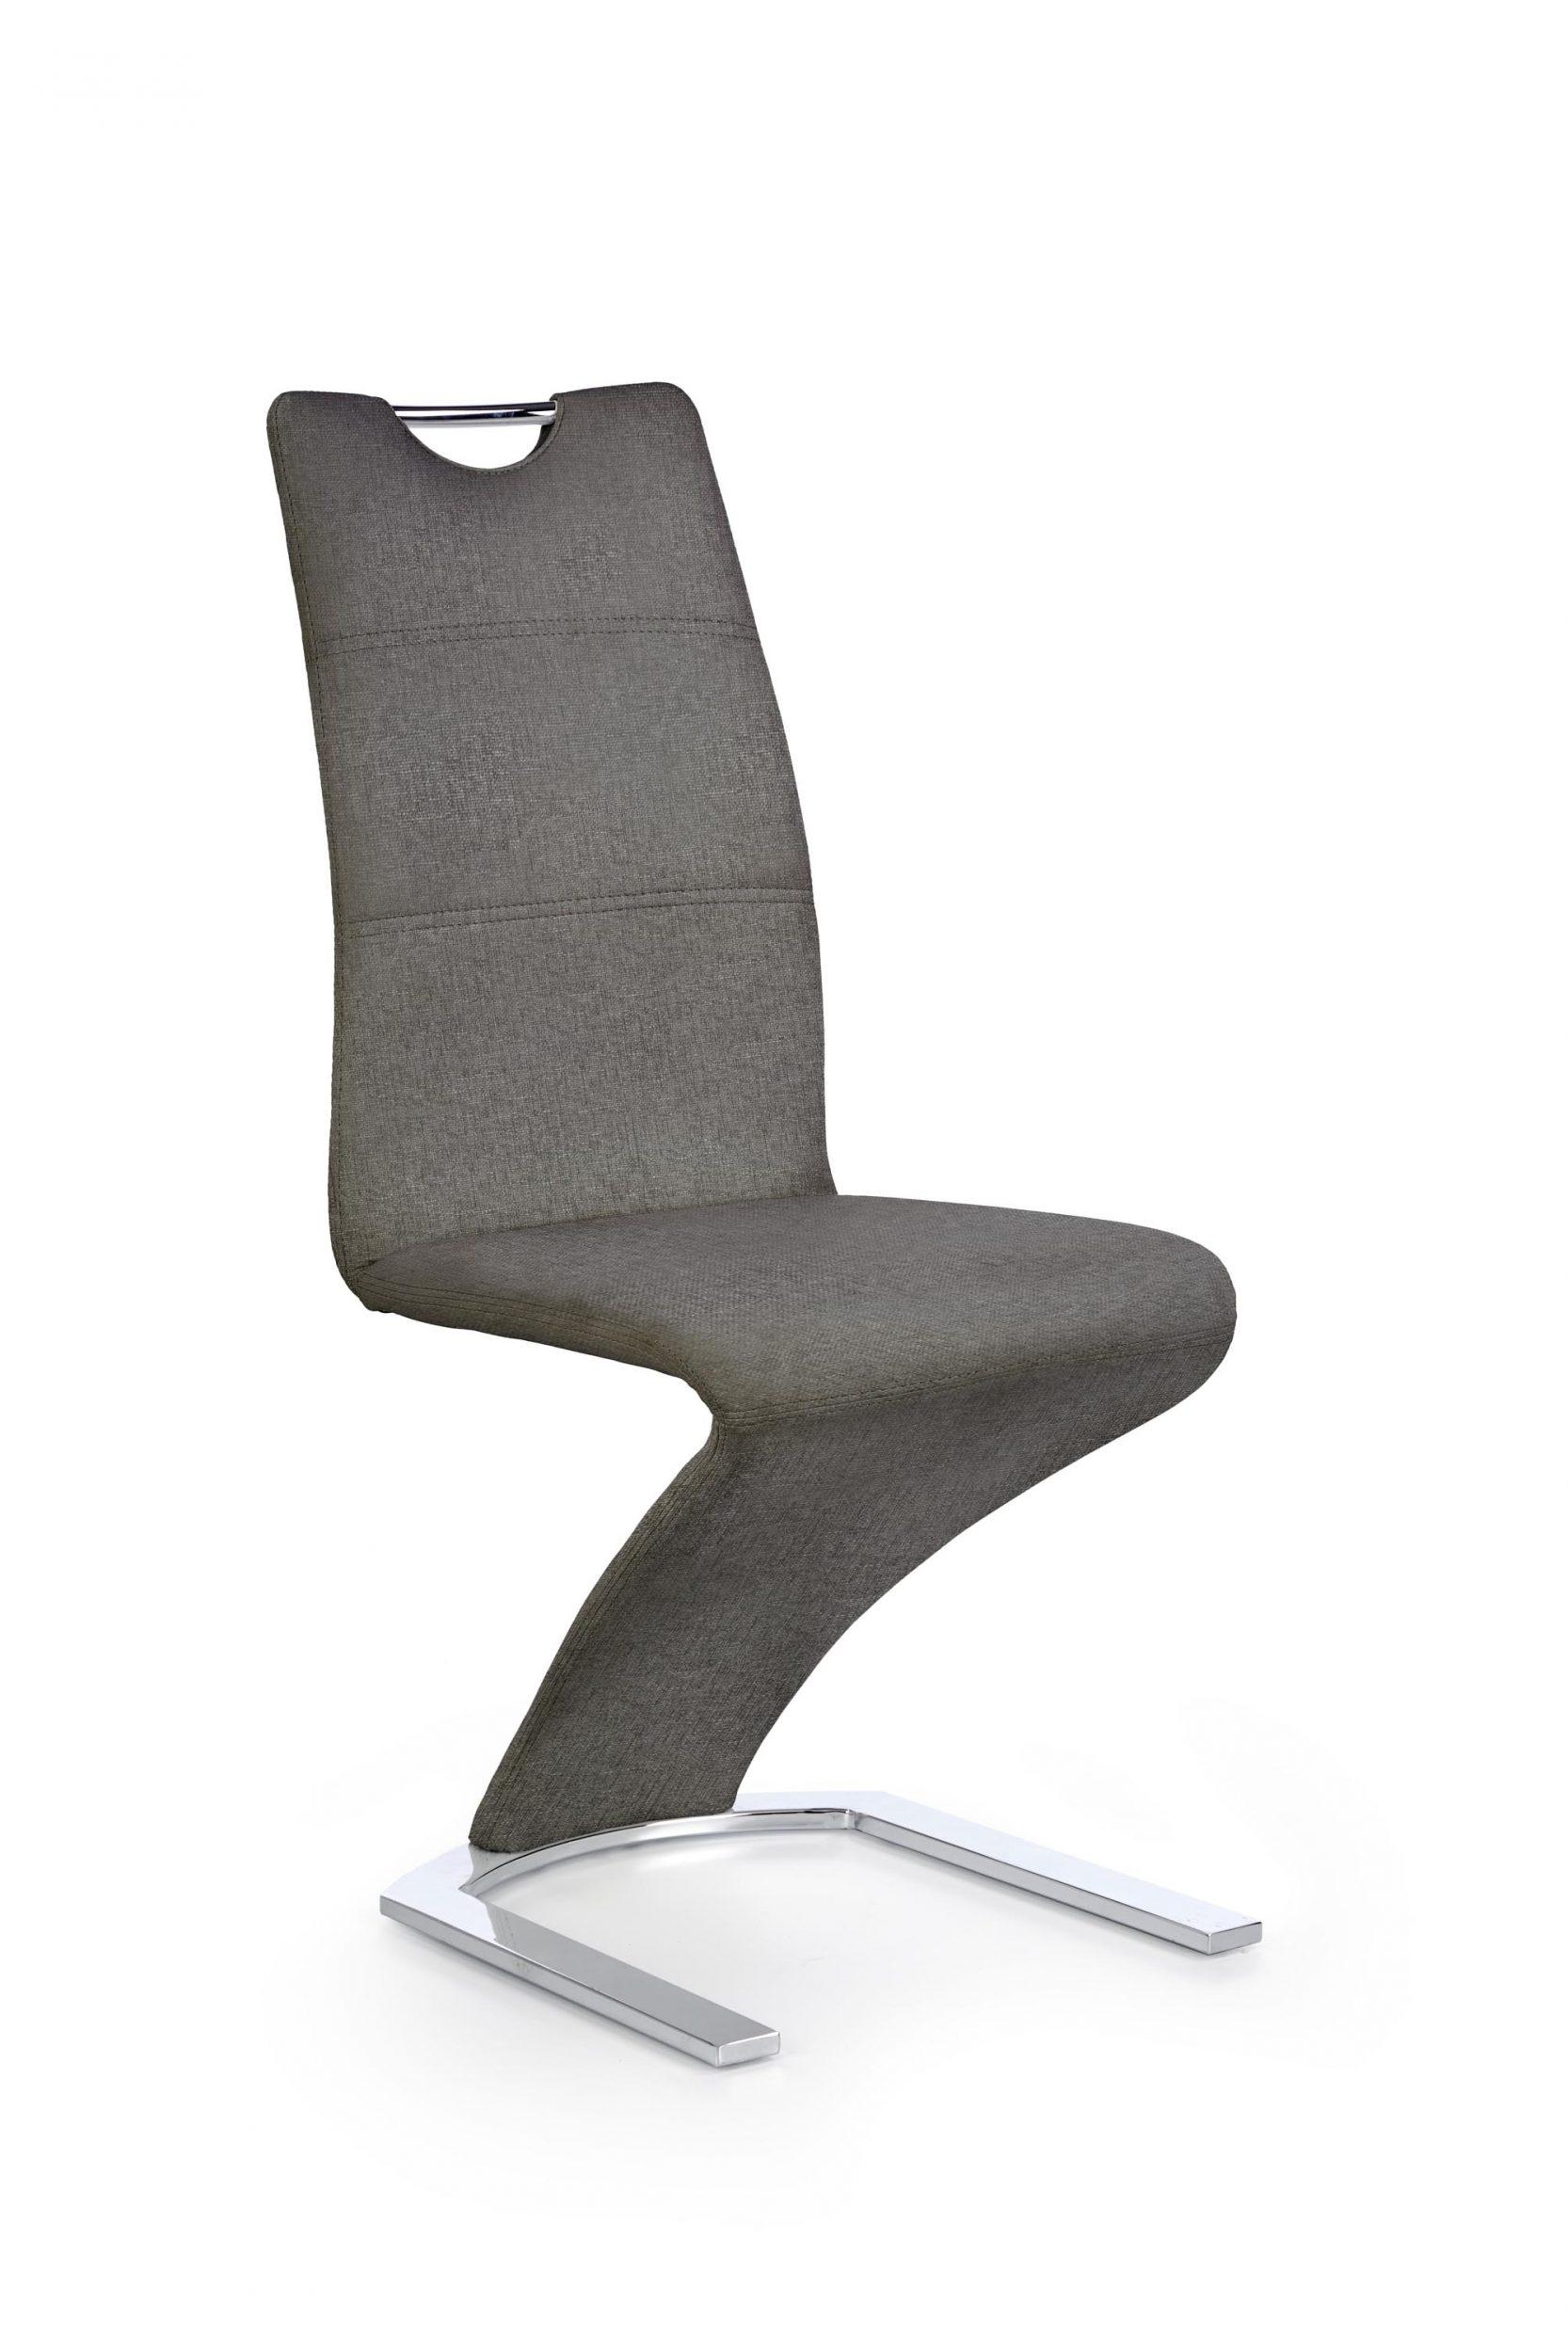 Scaun tapitat cu stofa, cu picioare metalice K350 Gri / Crom, l45xA63xH101 cm imagine